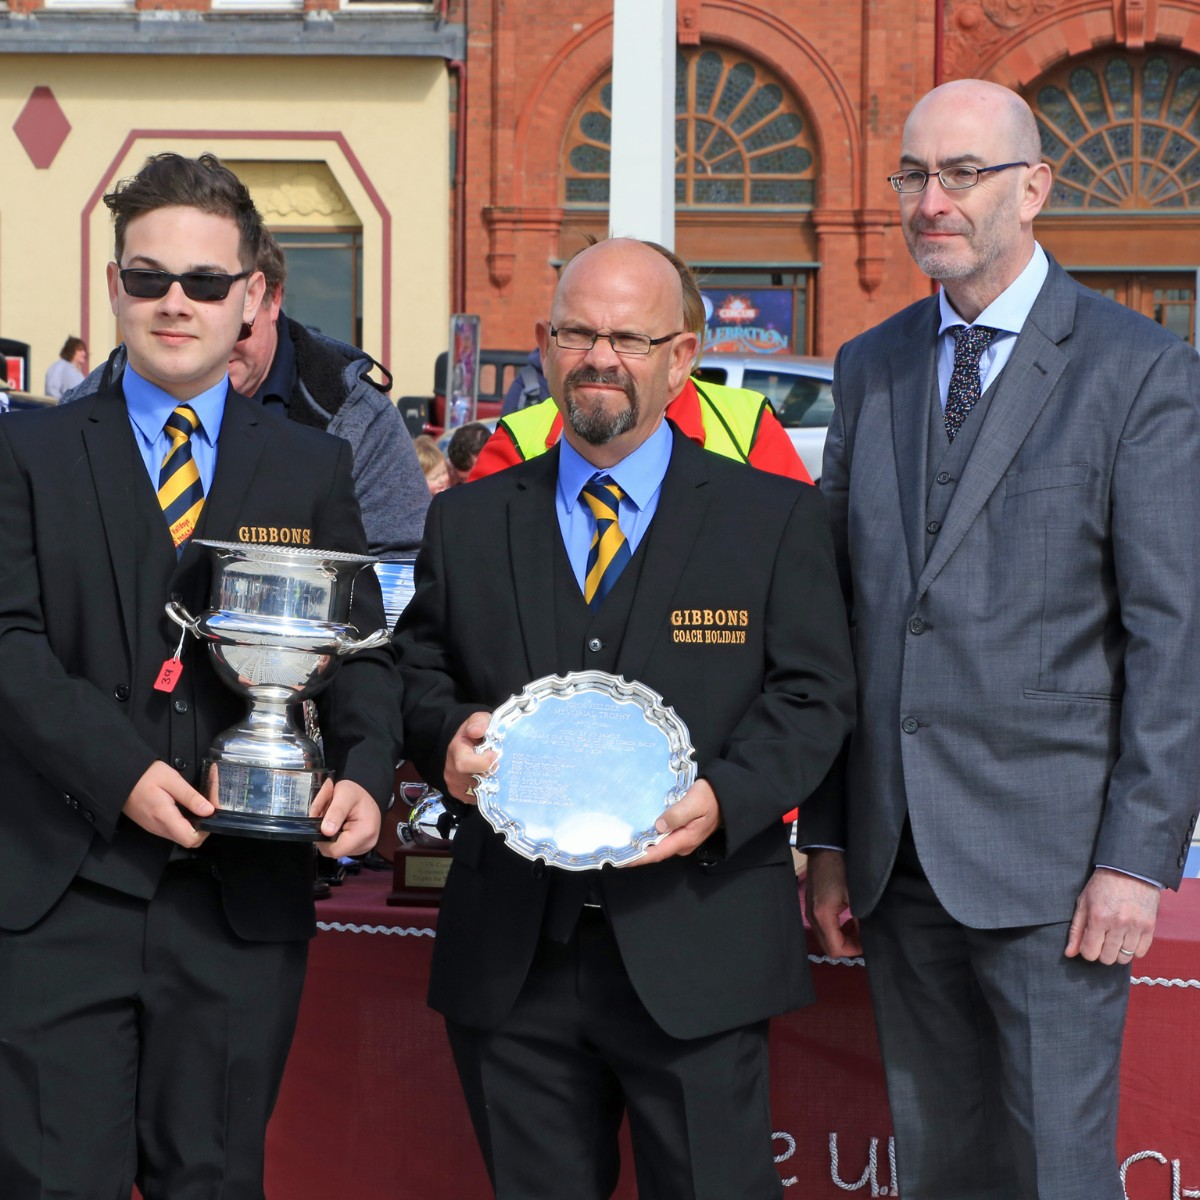 John Fielder Memorial Trophy for top coach from a small fleet - Gibbons Coach Holidays